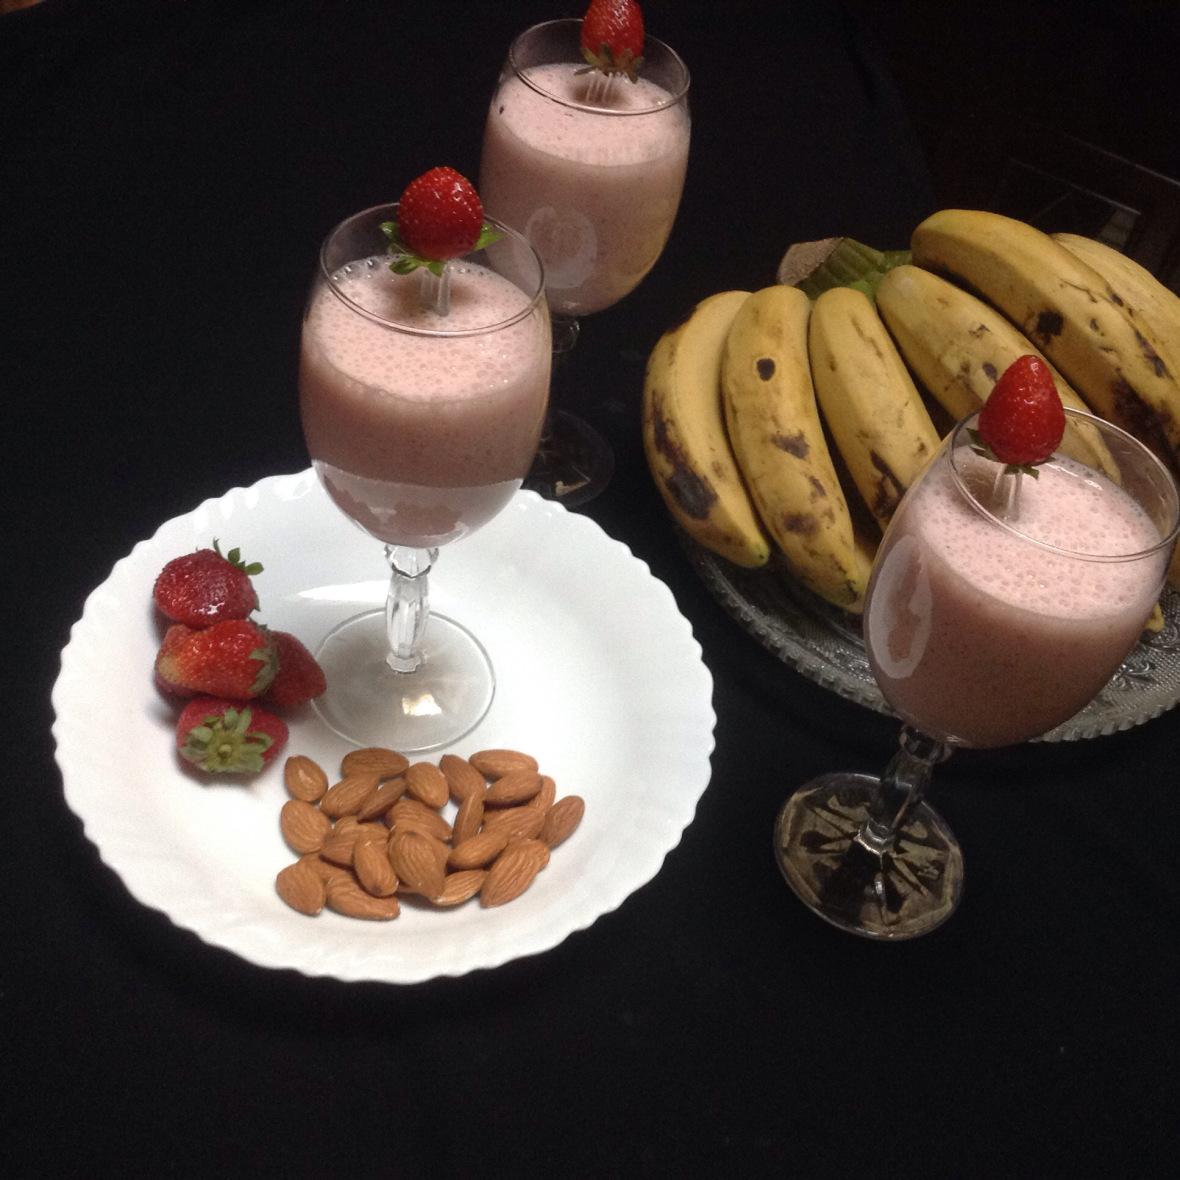 Fruits and Almond Milkshake